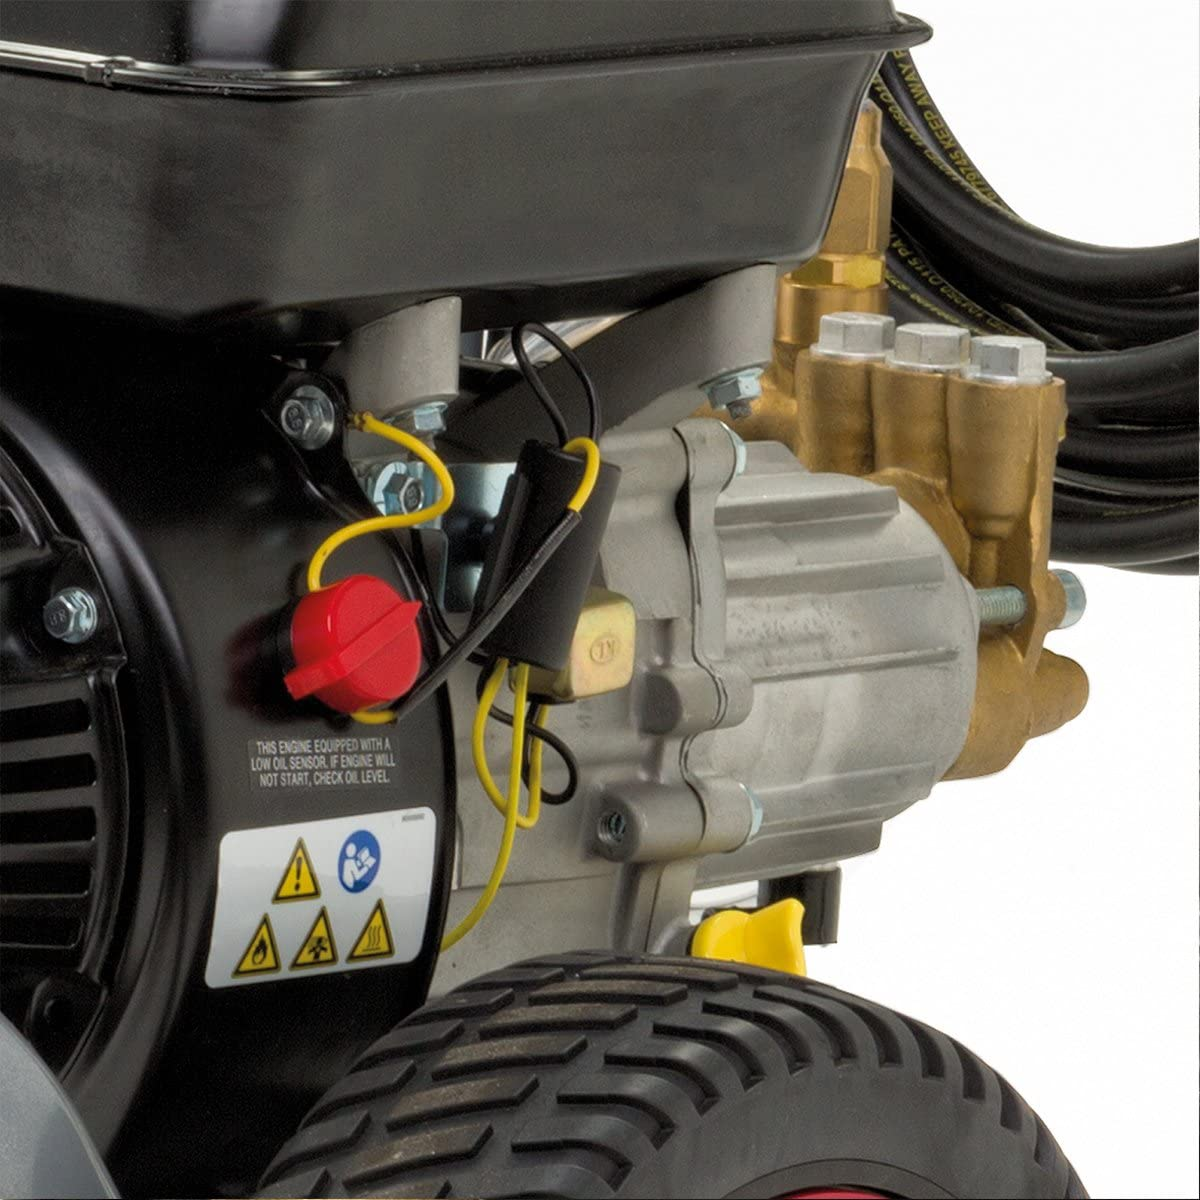 Briggs and Stratton 020377 BPW2000 Hidrolimpiadora de Alta presi/ón de Gasolina 2000 PSI//138 bares-500 Series OHV 158 CC Motor